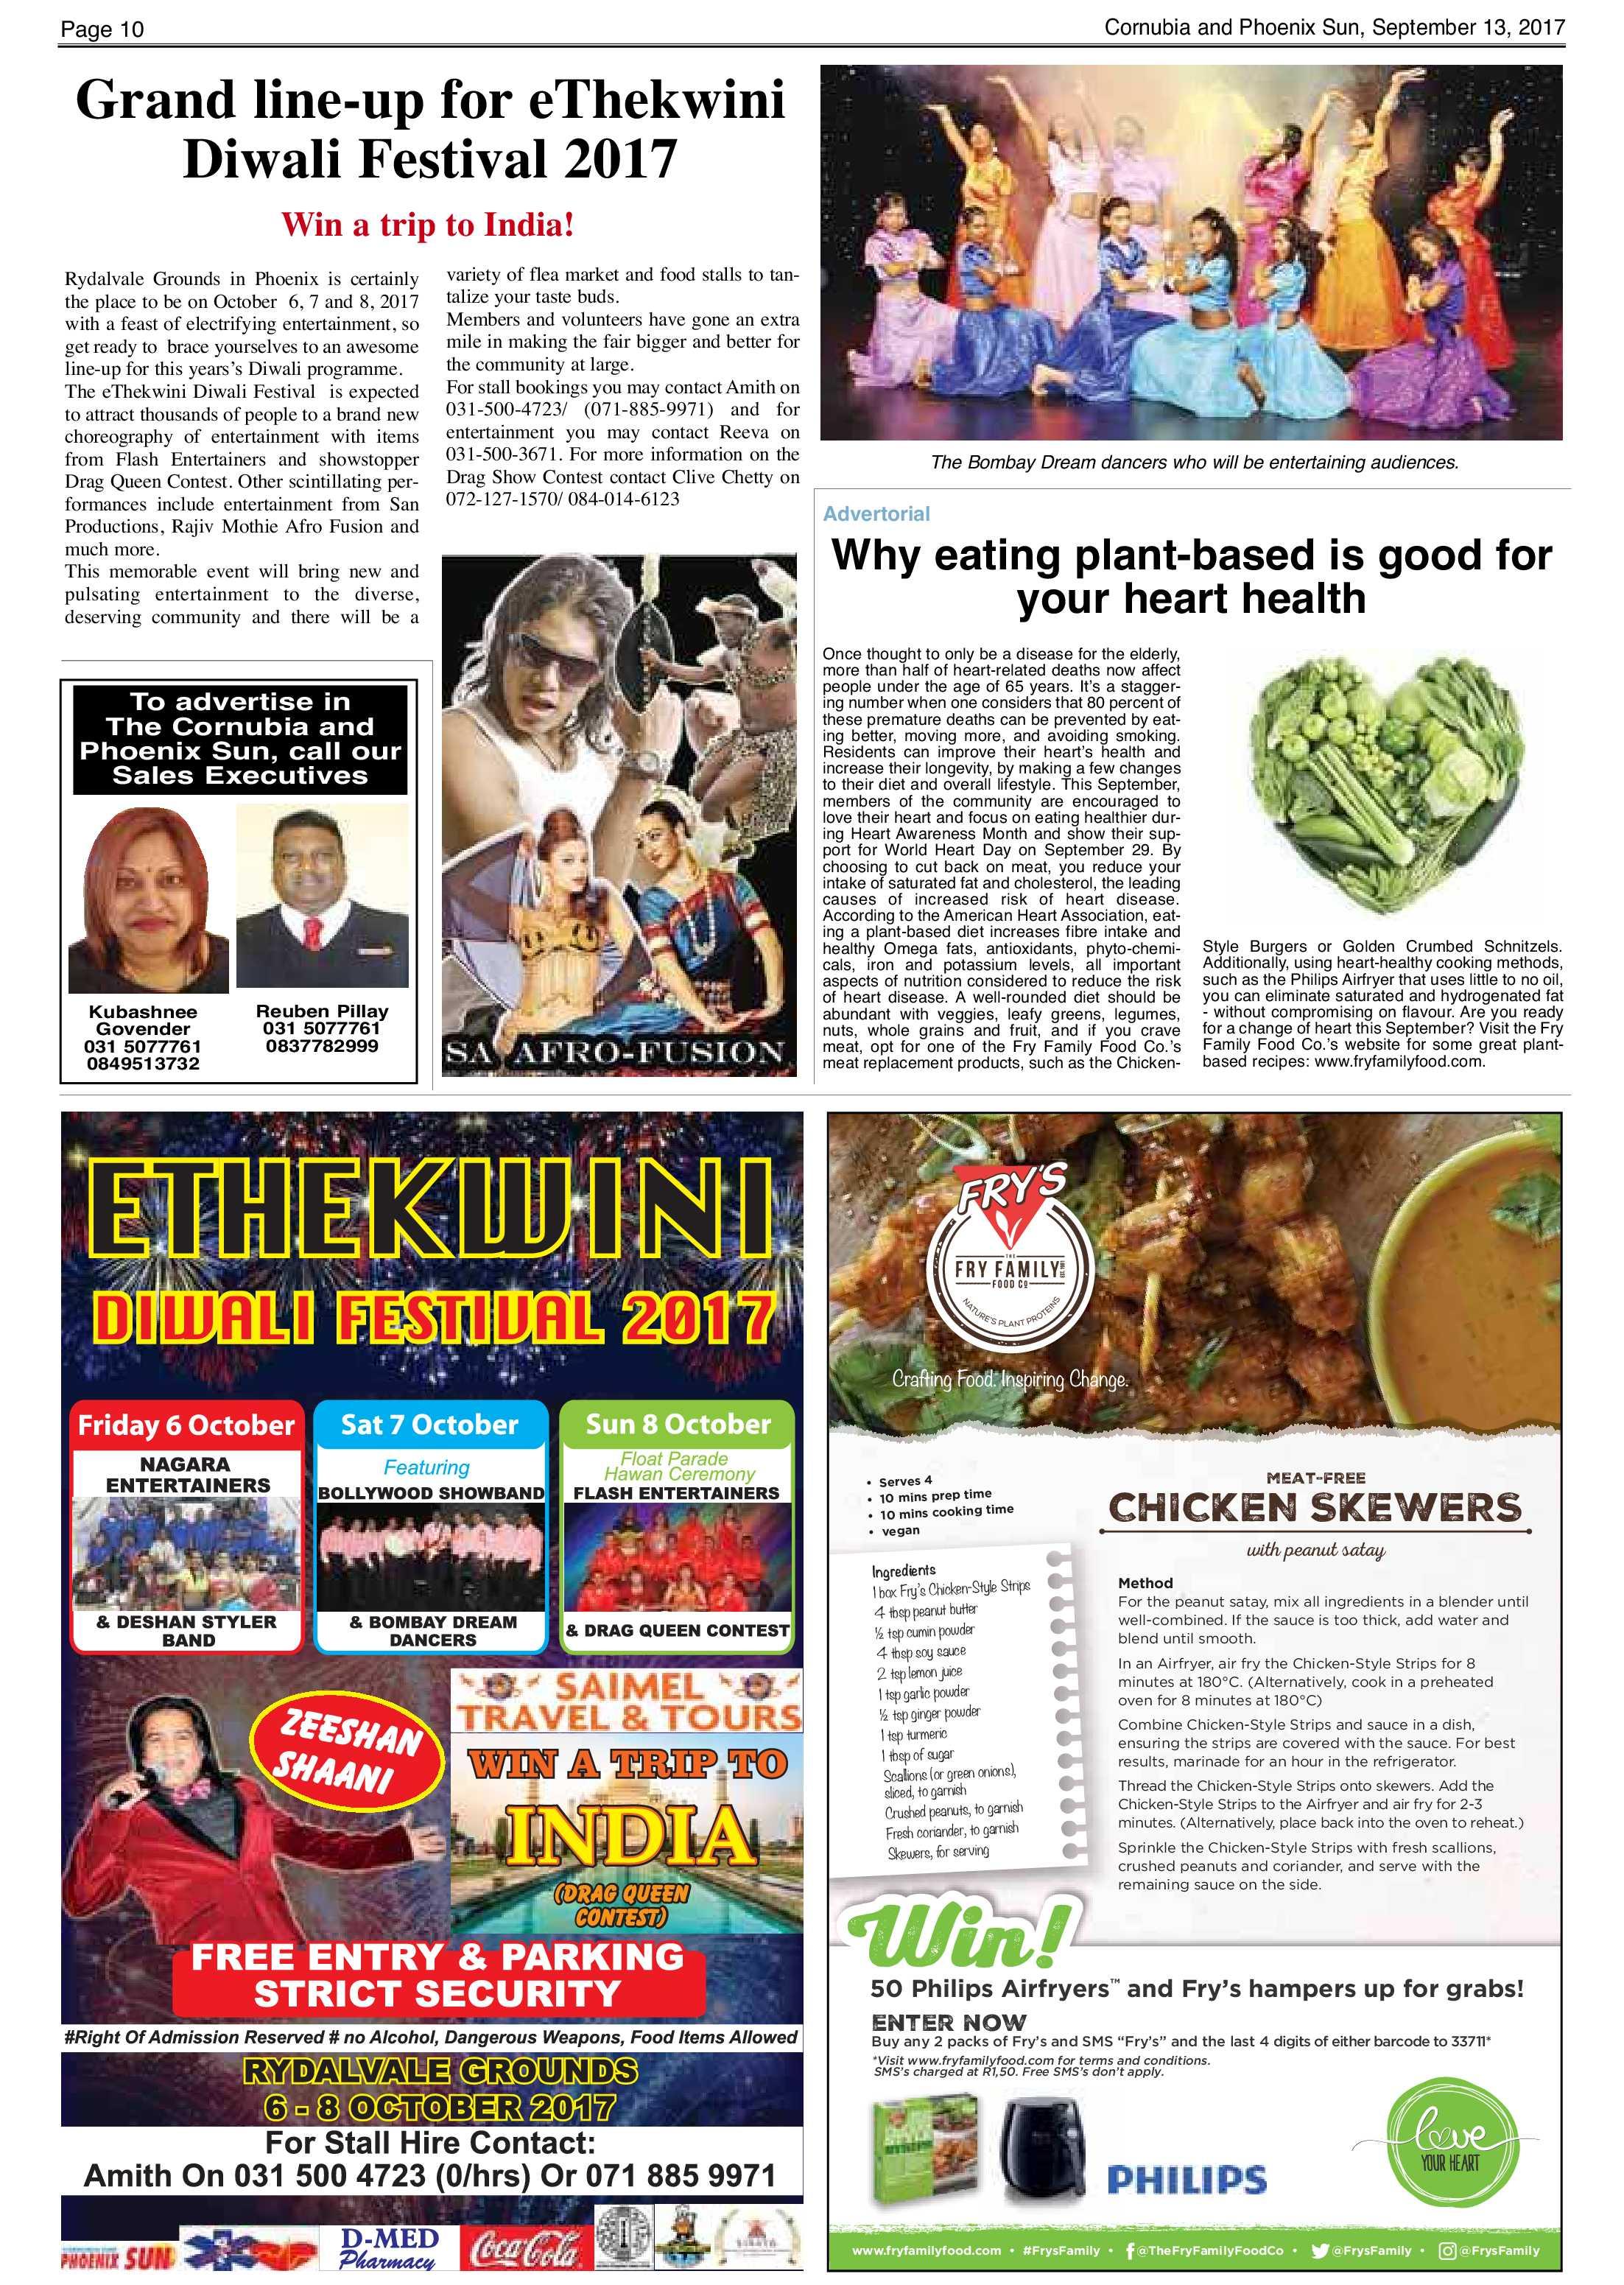 cornubia-phoenix-sun-september-13-epapers-page-10